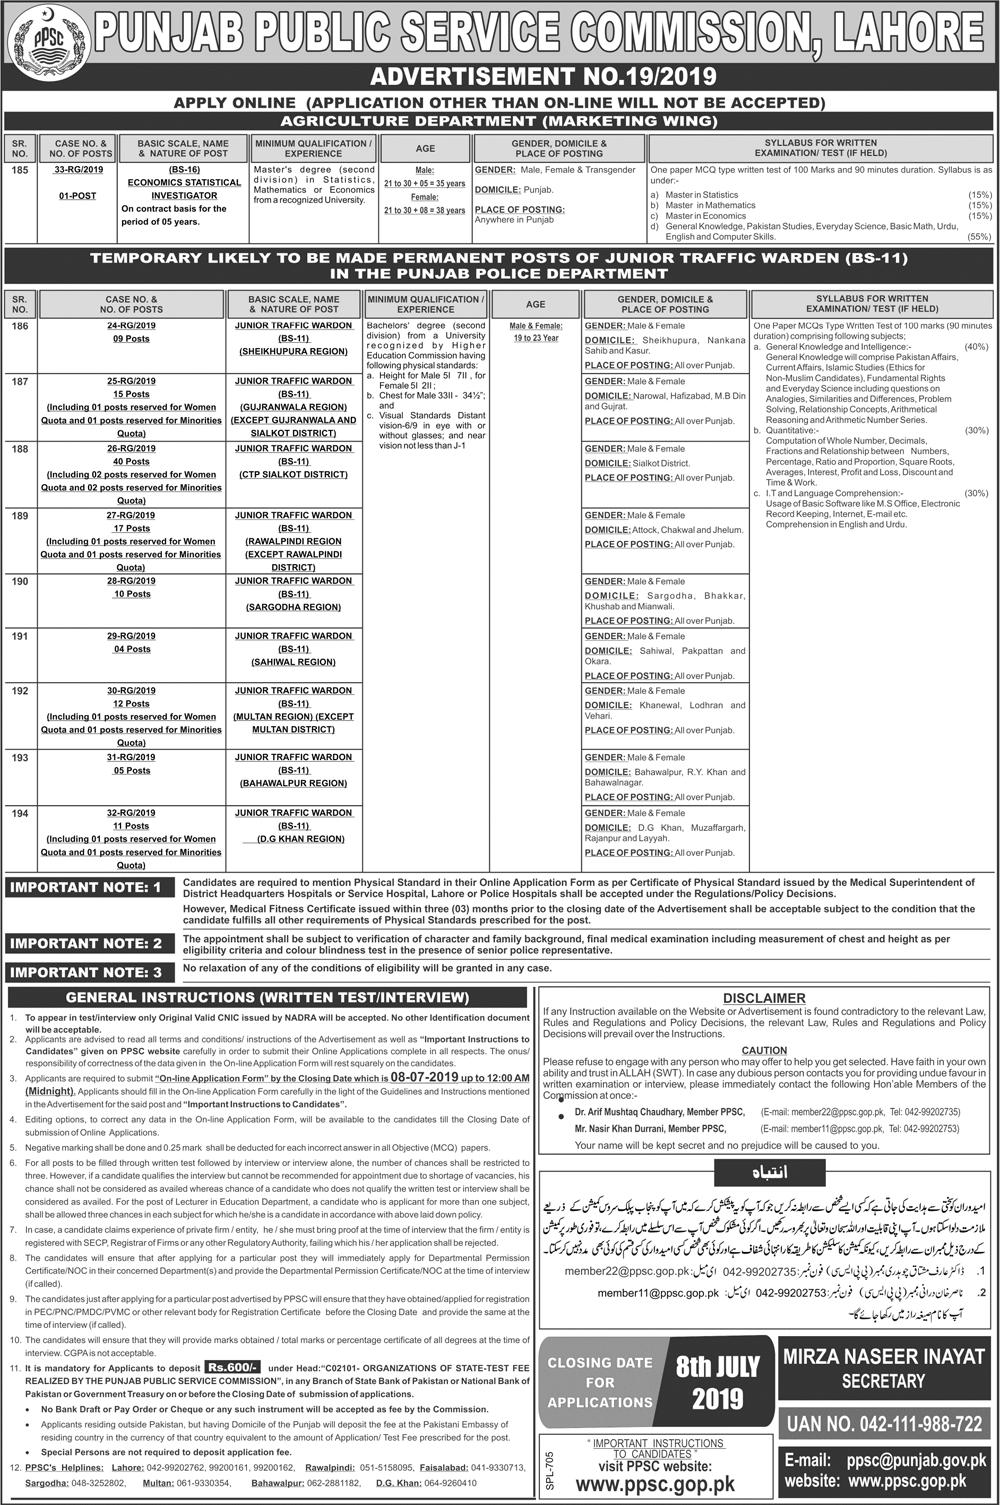 PPSC Jobs 2019 Junior Traffic Warden in Punjab Police